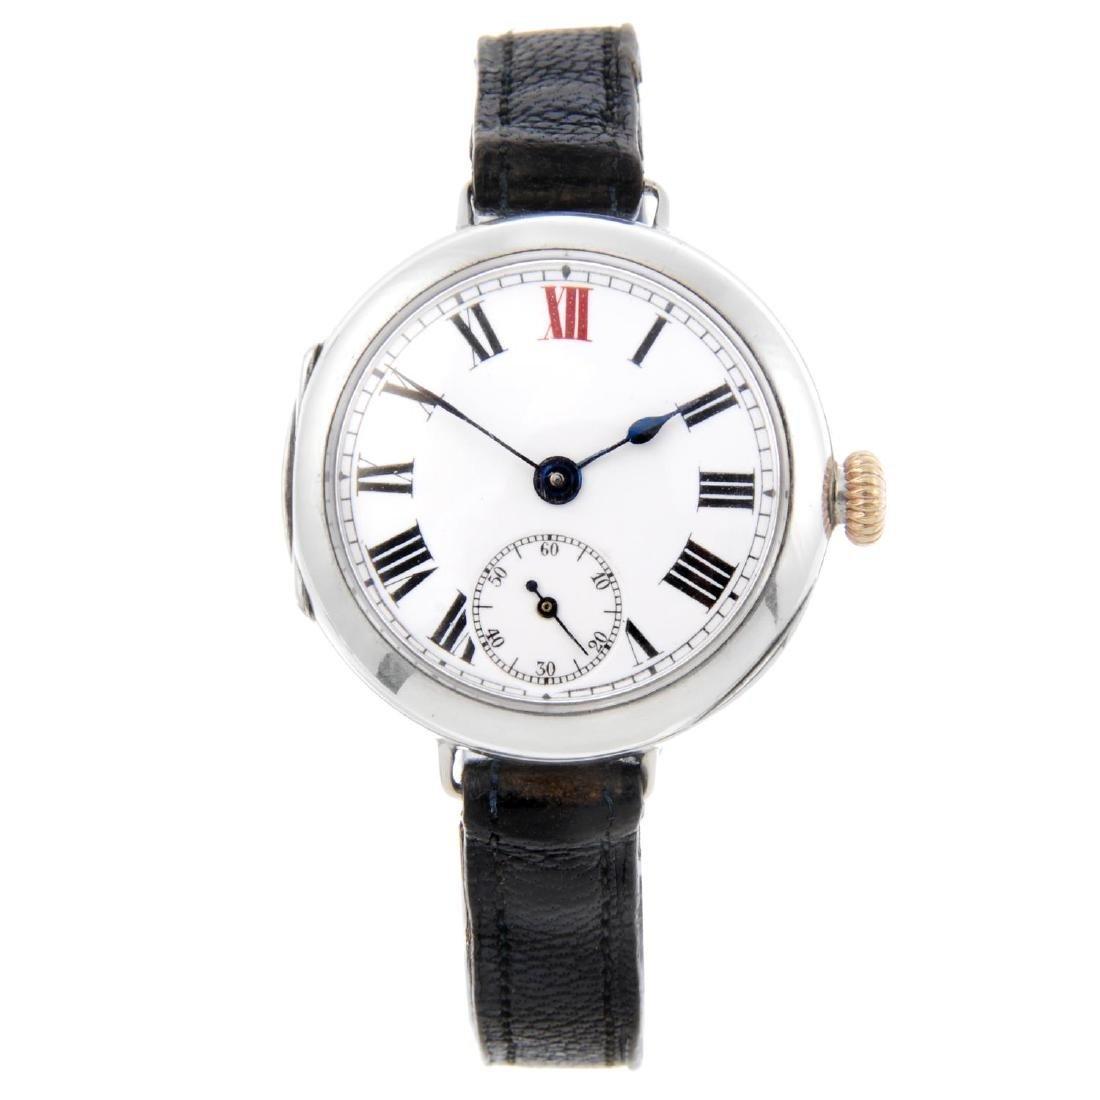 ROLEX - a gentleman's trench style wrist watch. Silver